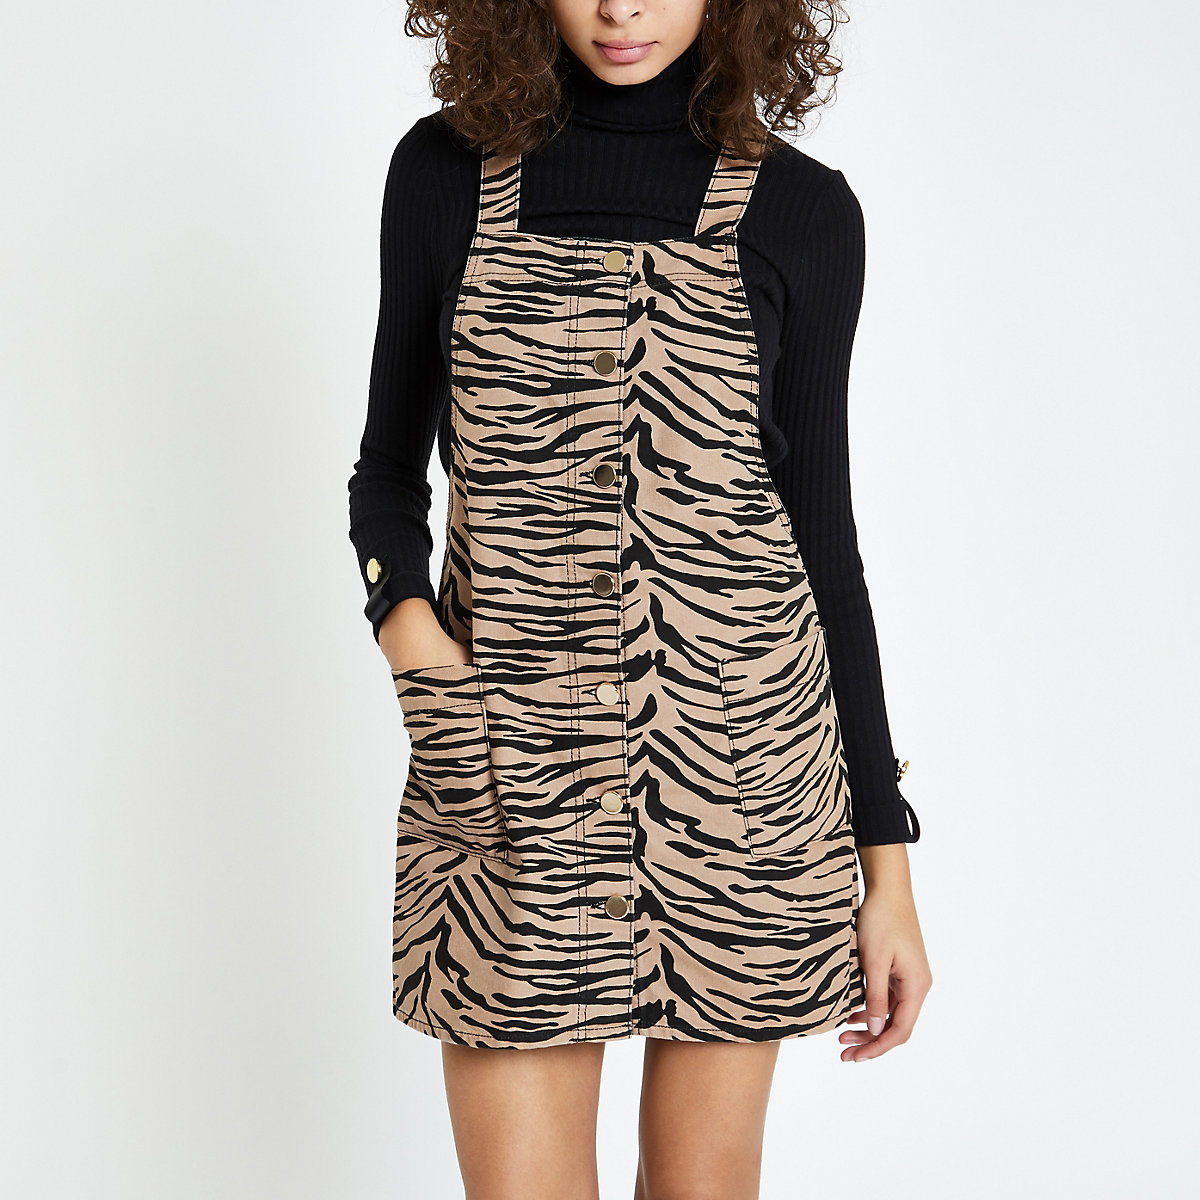 Brown zebra print overall dress